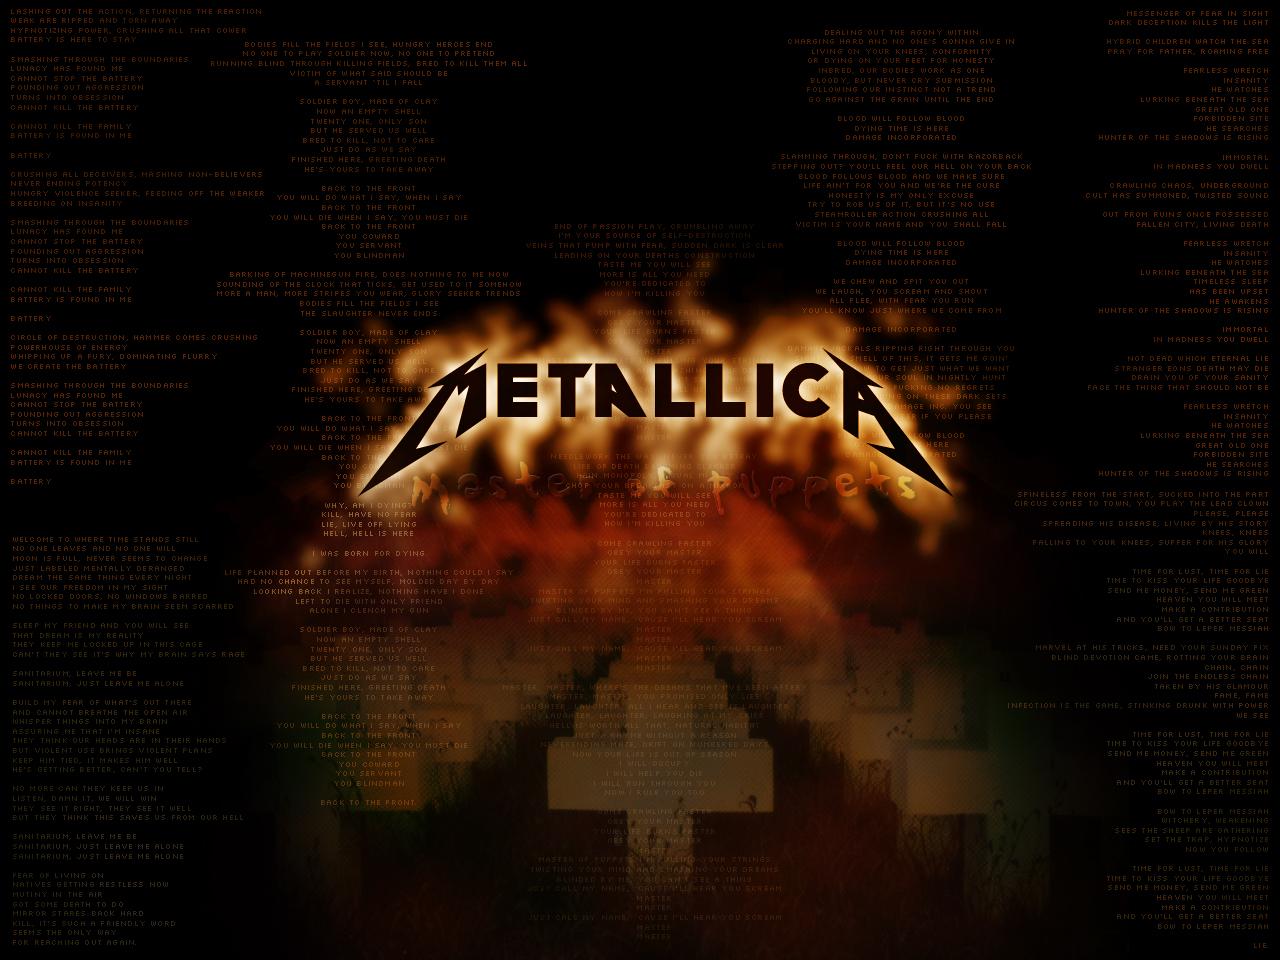 49 Metallica Master Of Puppets Wallpaper On Wallpapersafari